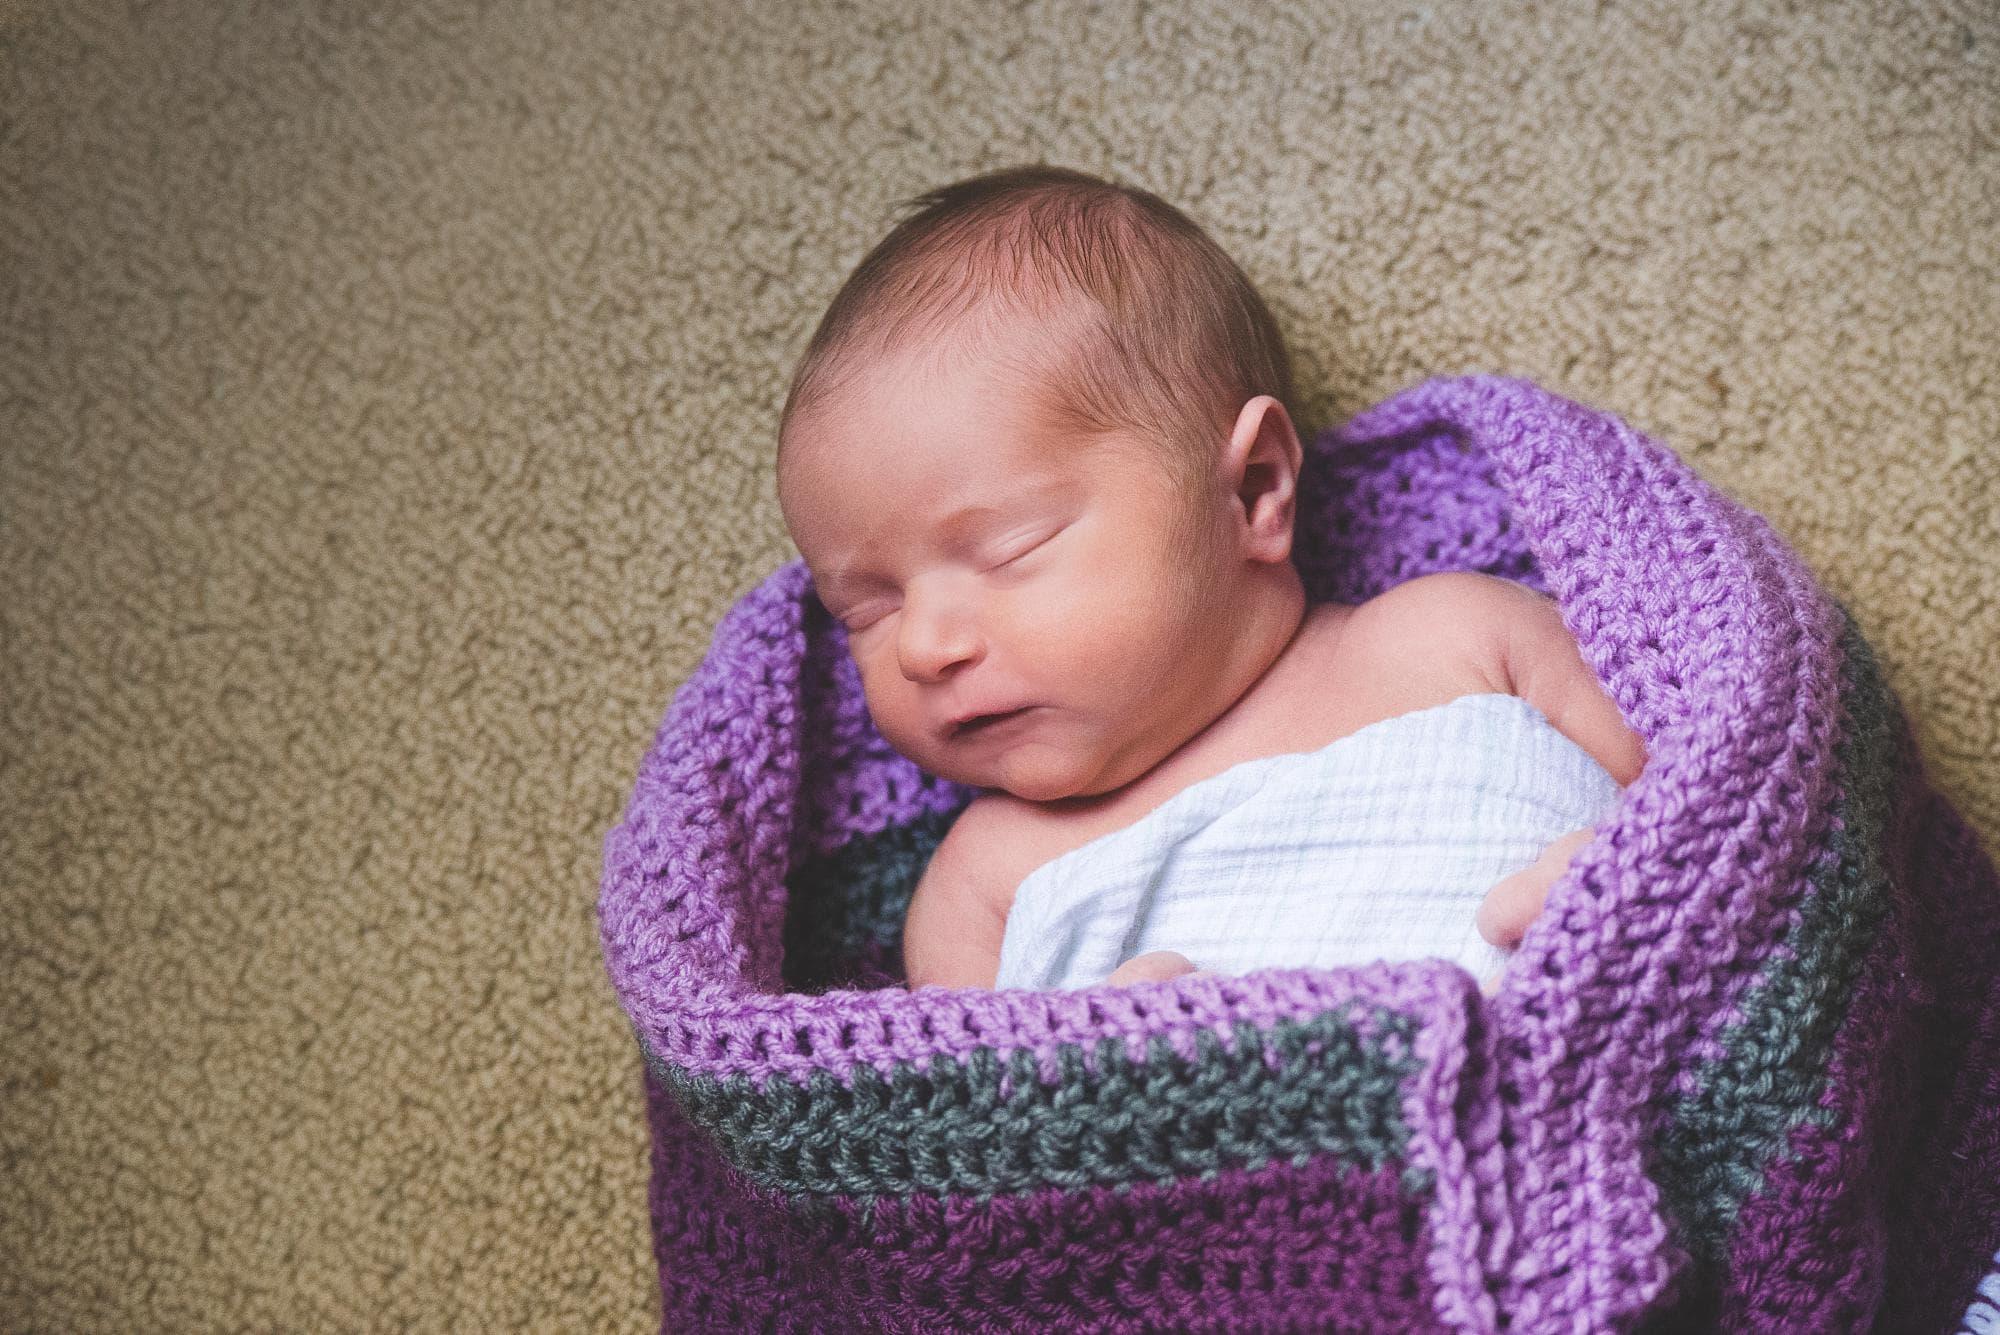 newborn-girl-purple-crochet-blanket-lifestyle